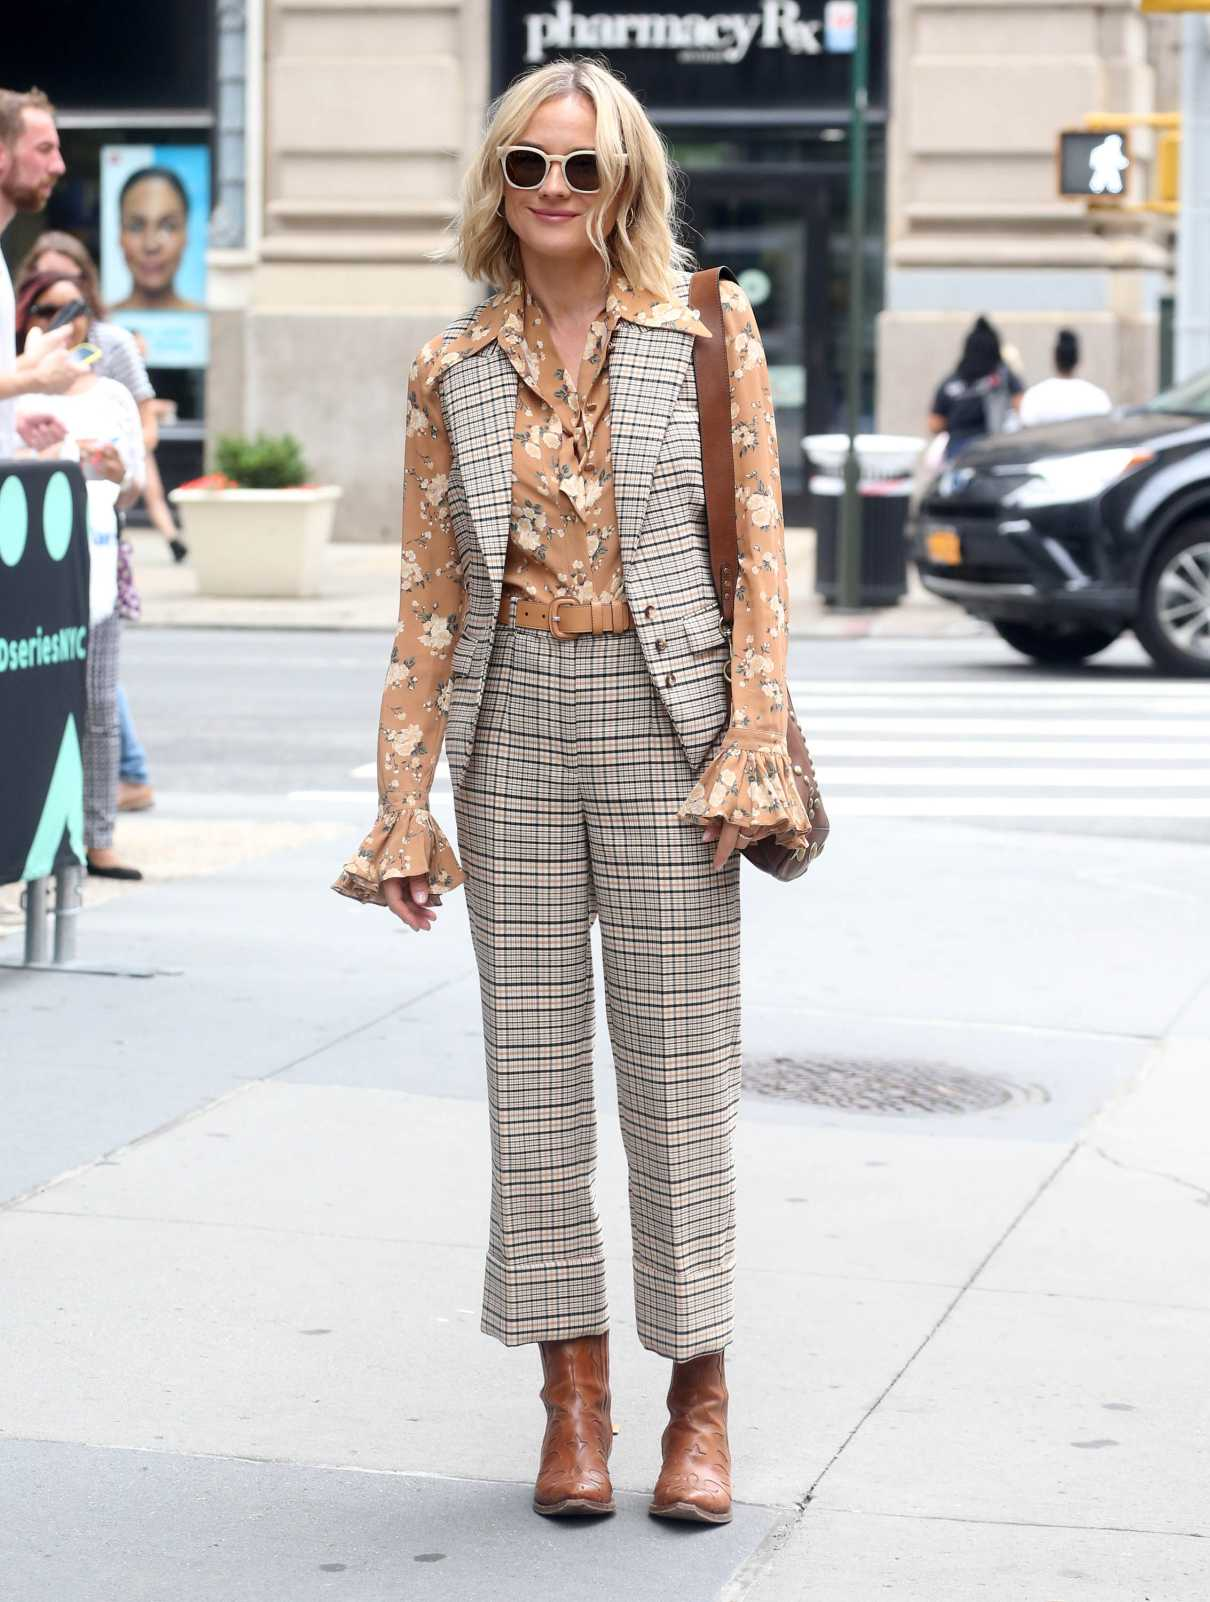 Diane Kruger in a Plaid Suit